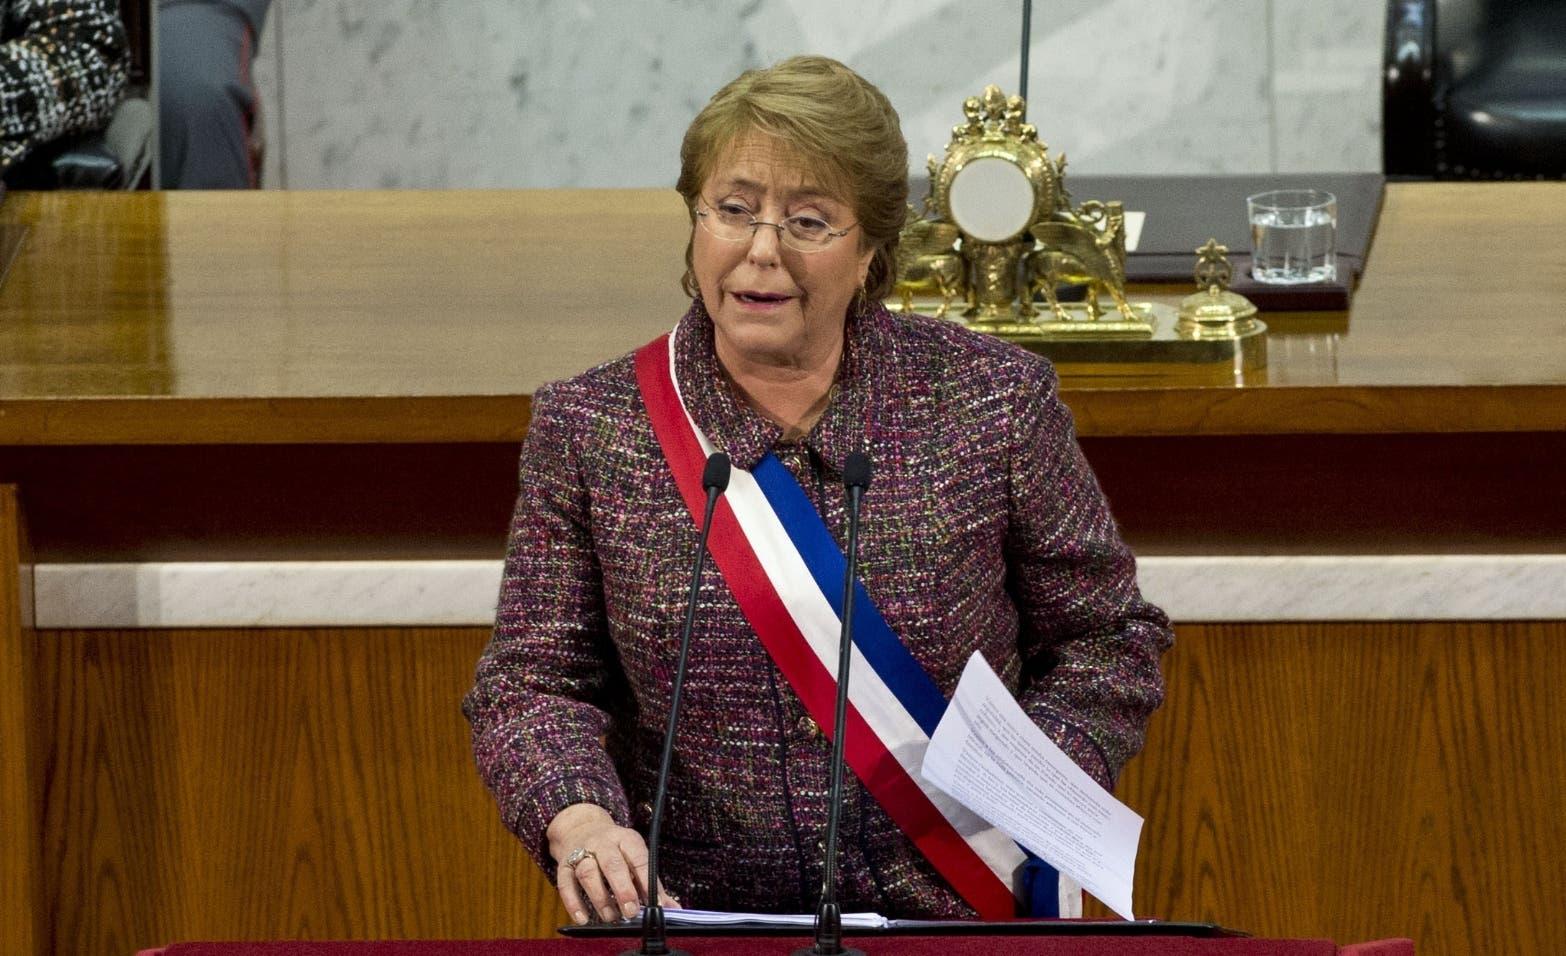 CHILE-POLITICS-BACHELET